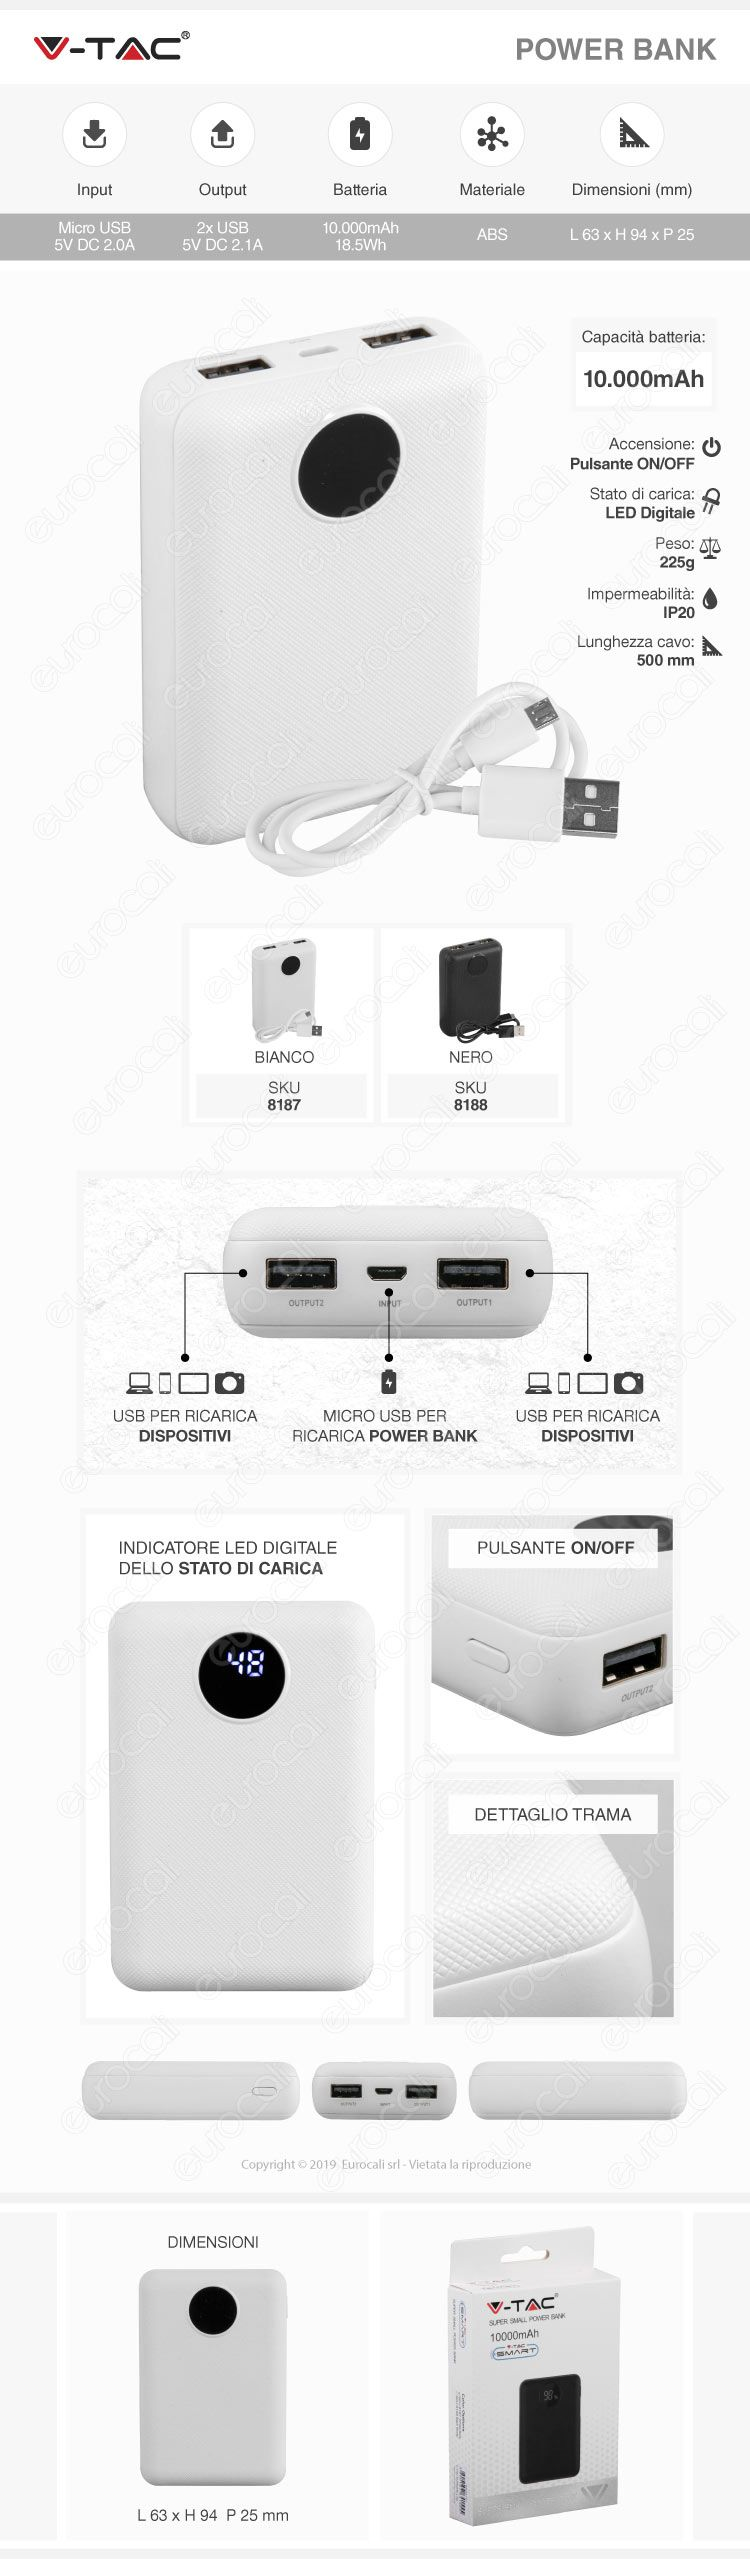 V-Tac VT-3501 Power Bank Portatile 10000 mAh 2 Uscite USB 2,1A